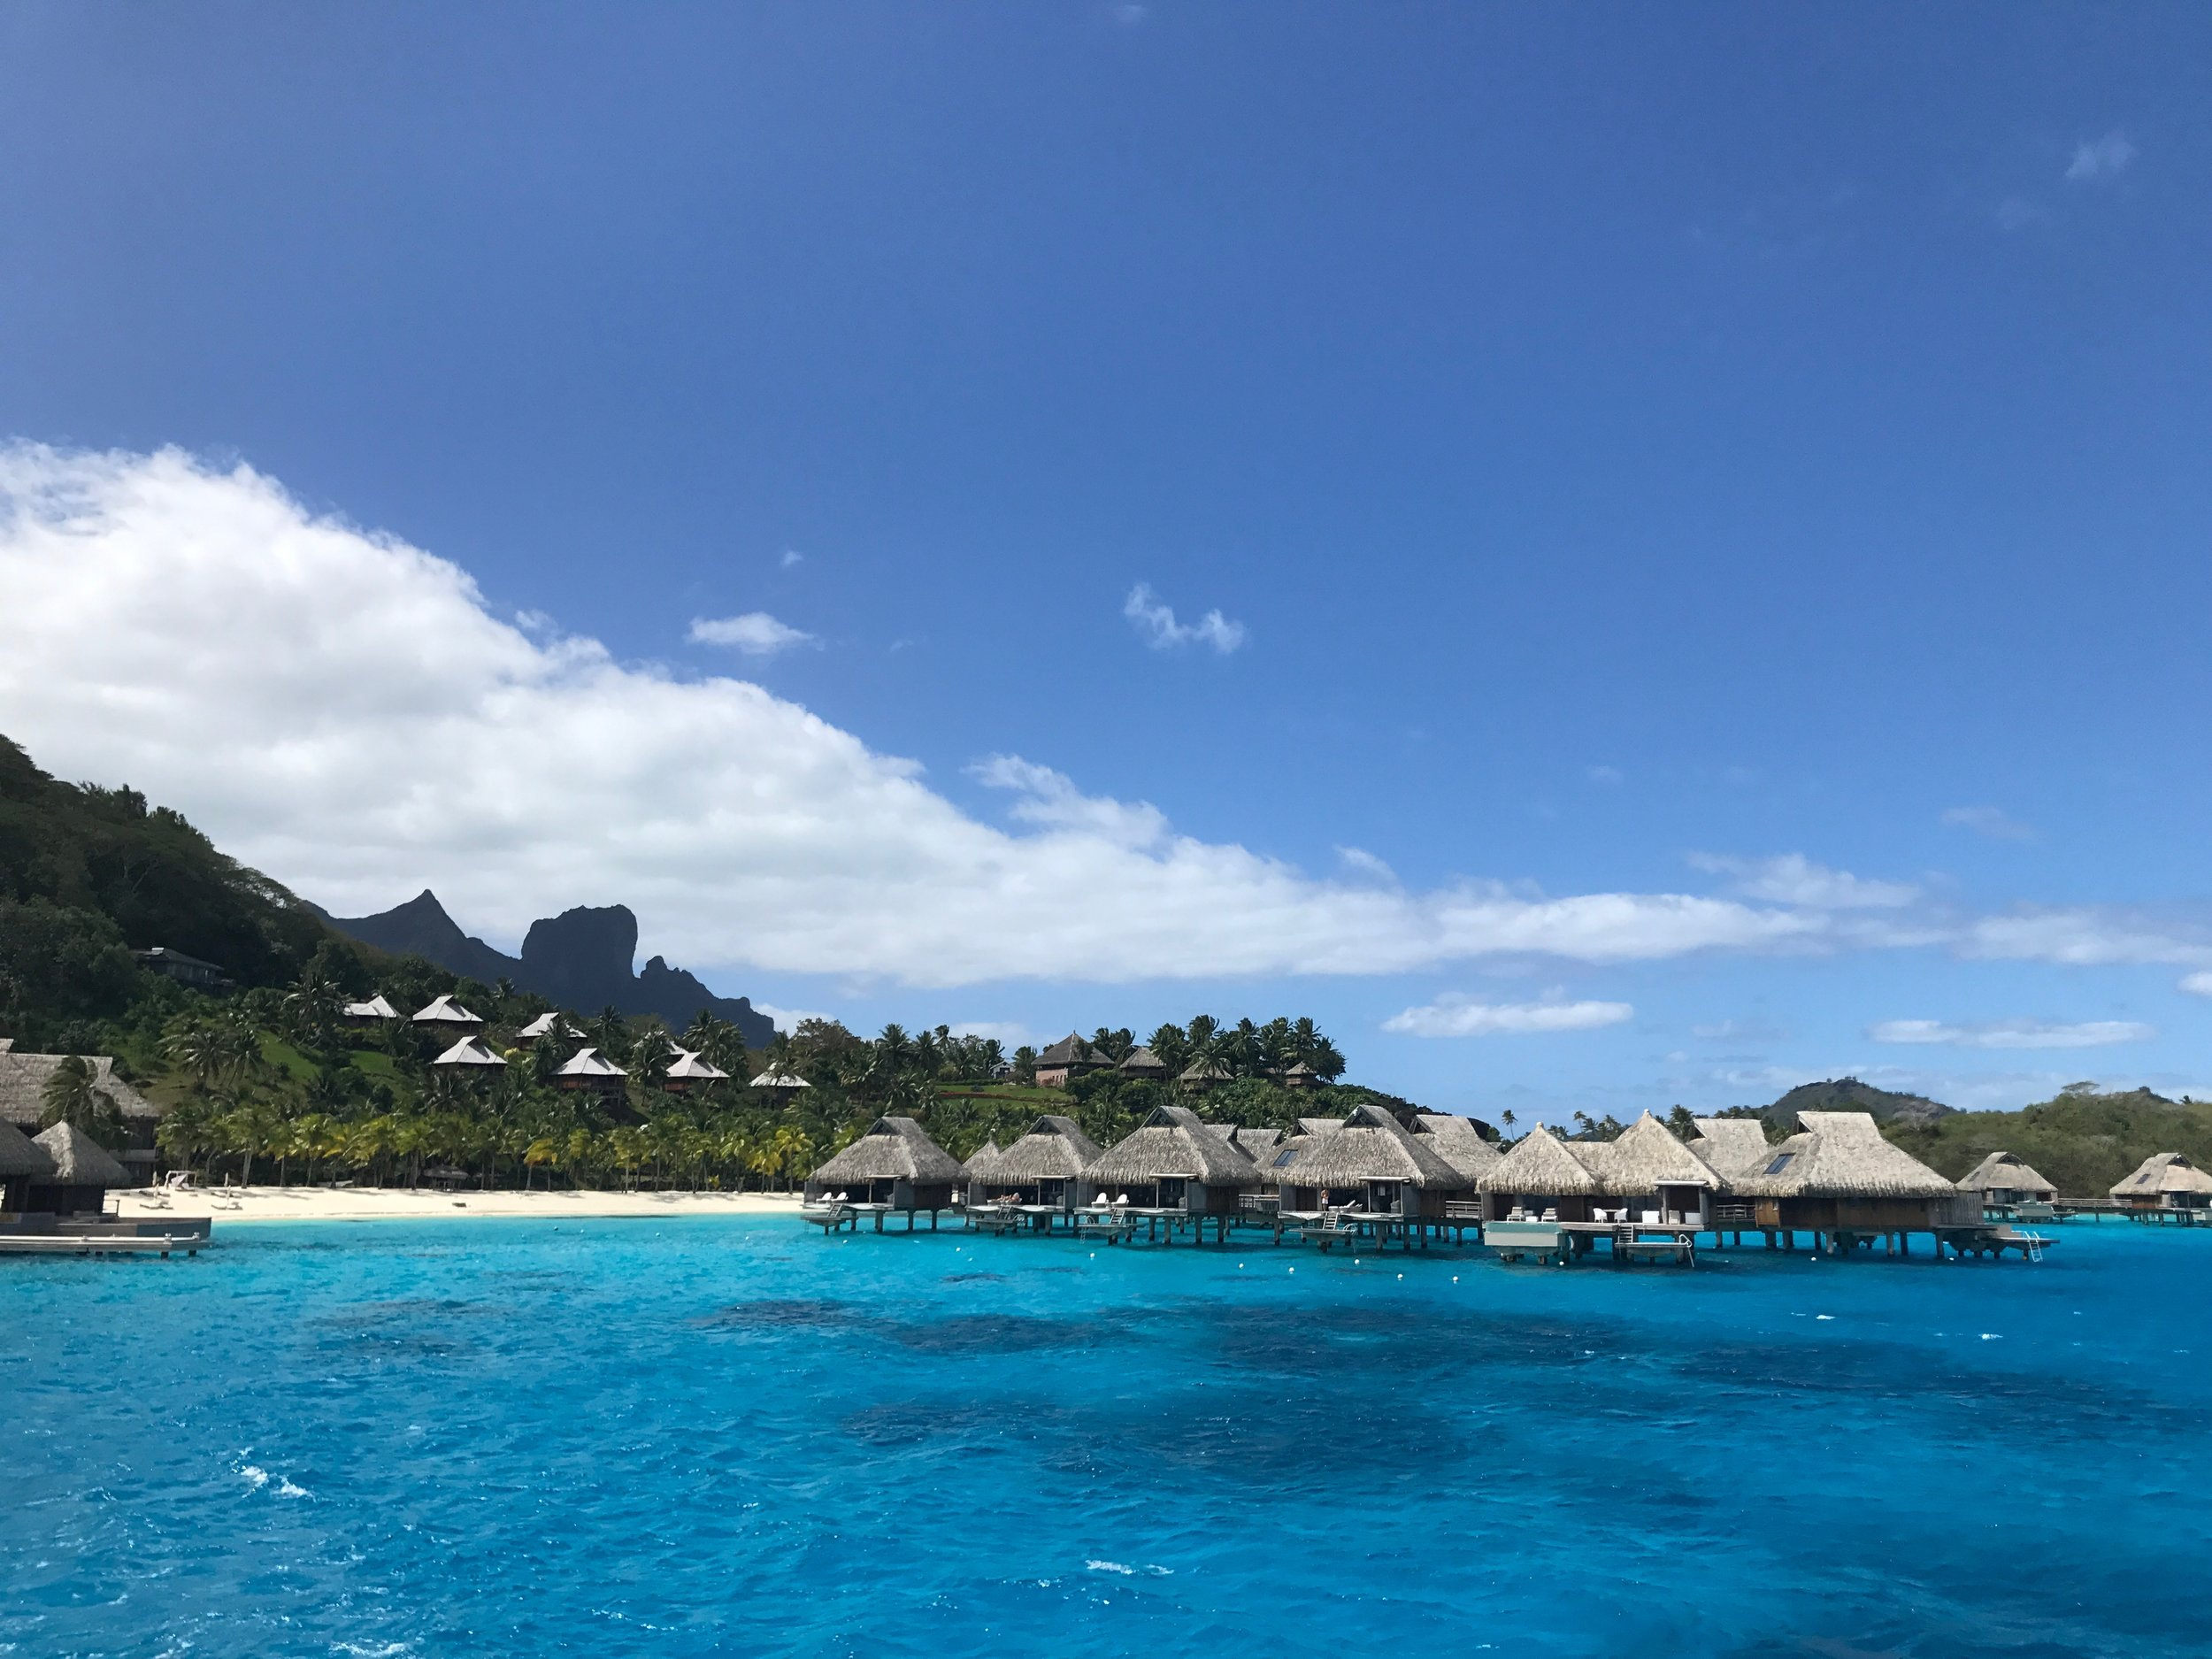 The Conrad Bora Bora: Our home for a week!